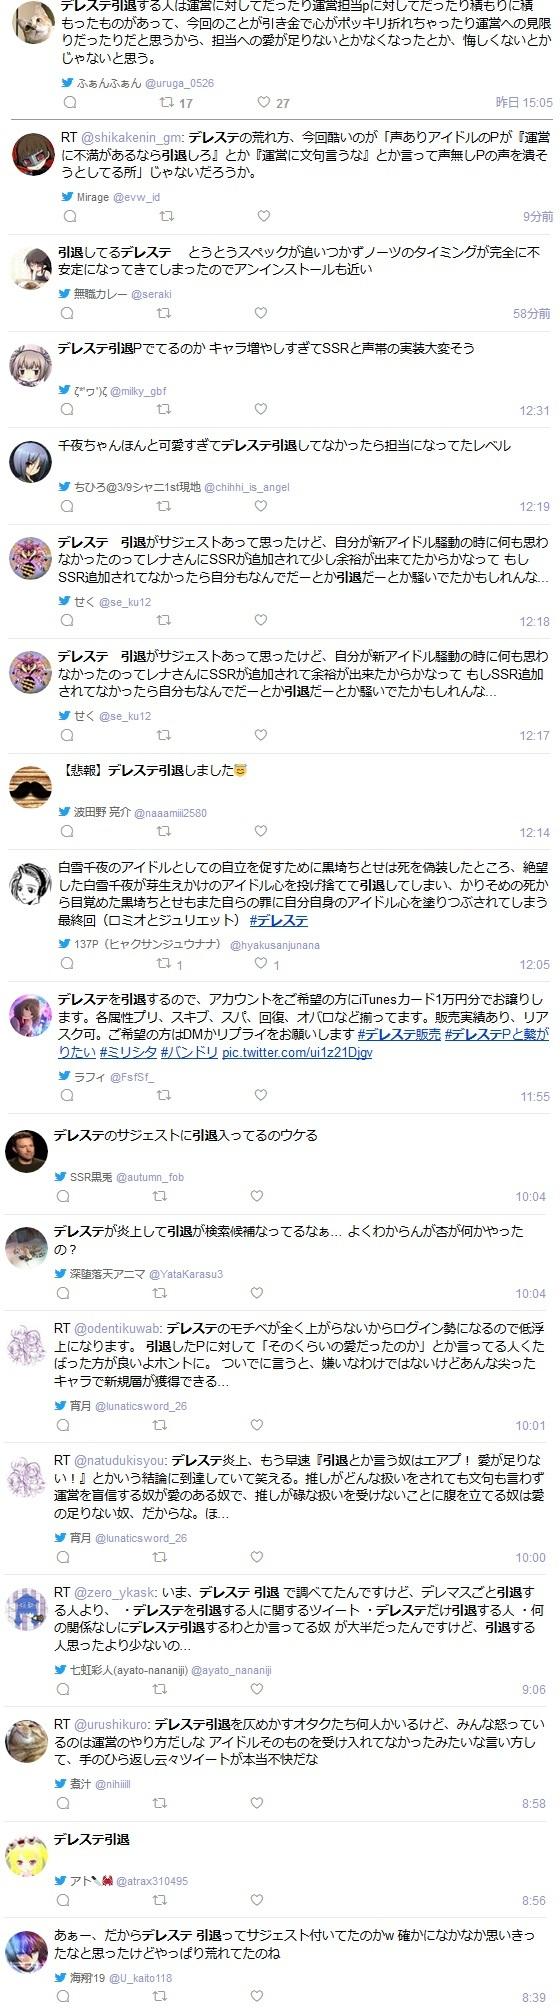 isekaidemofuzokujo-cut_fixw_640_hq_2019030313395138a.jpg